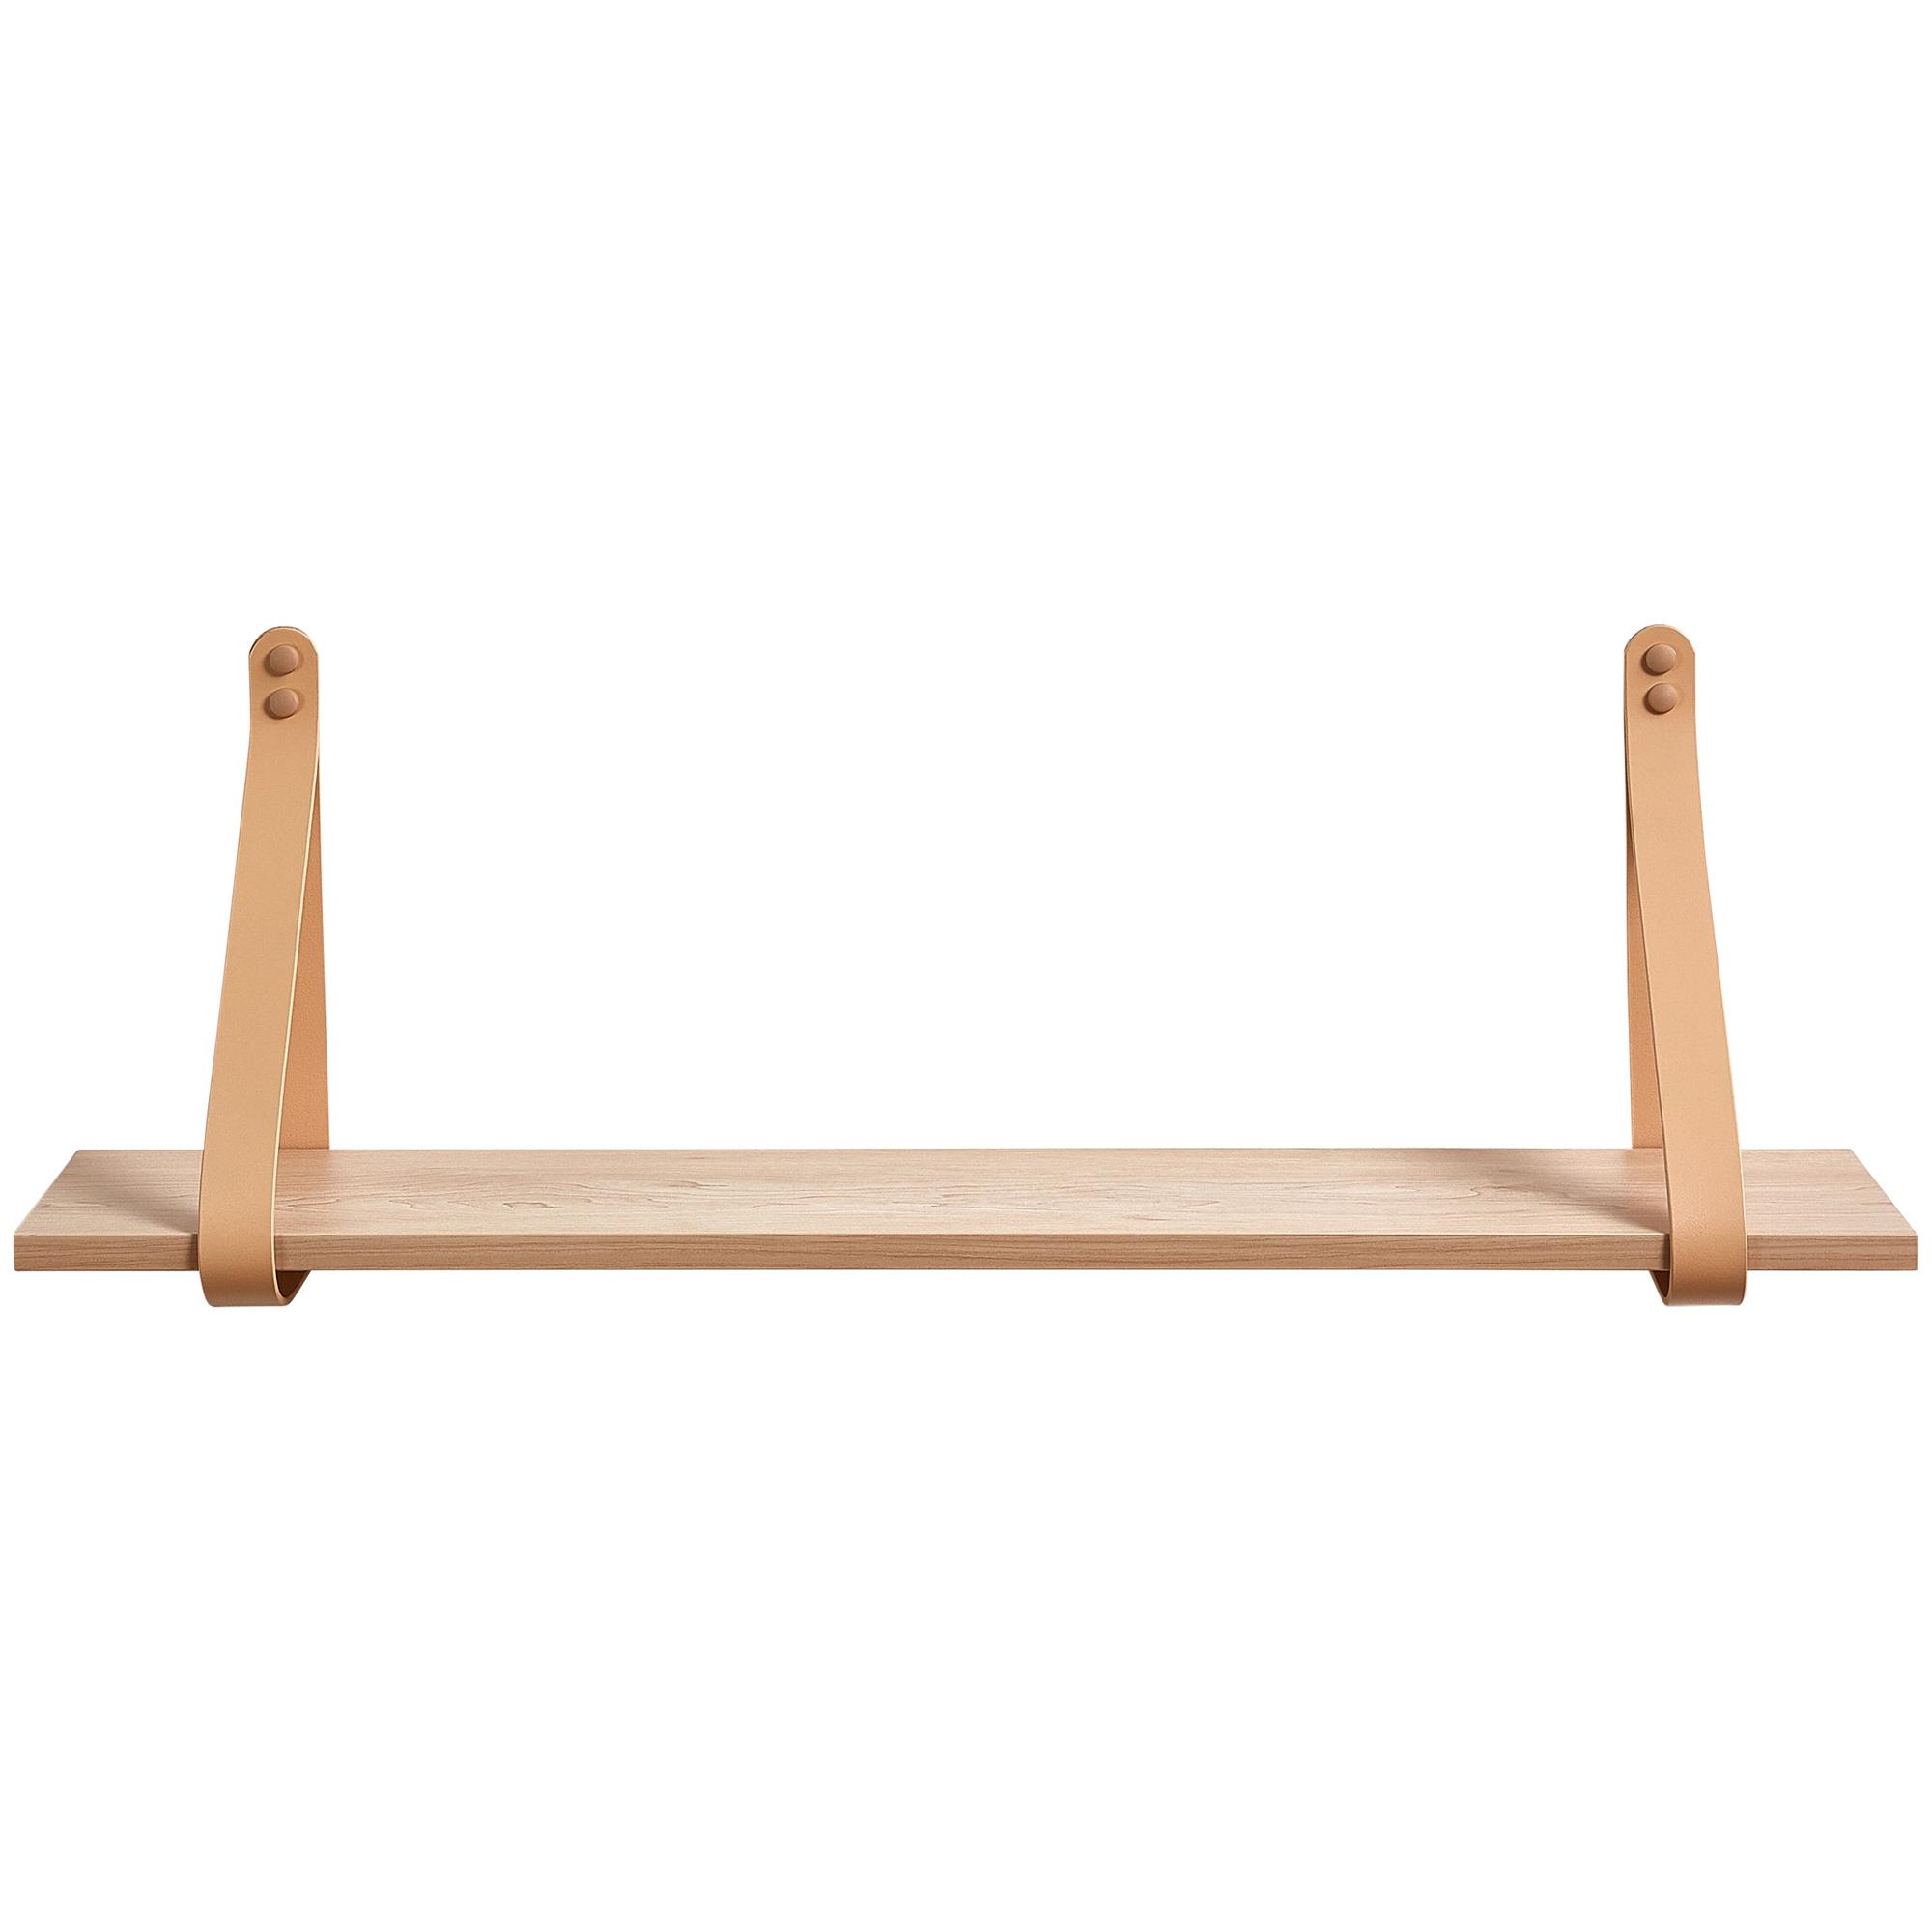 Zanui, Medium Nude Leather Strap Shelf, $159